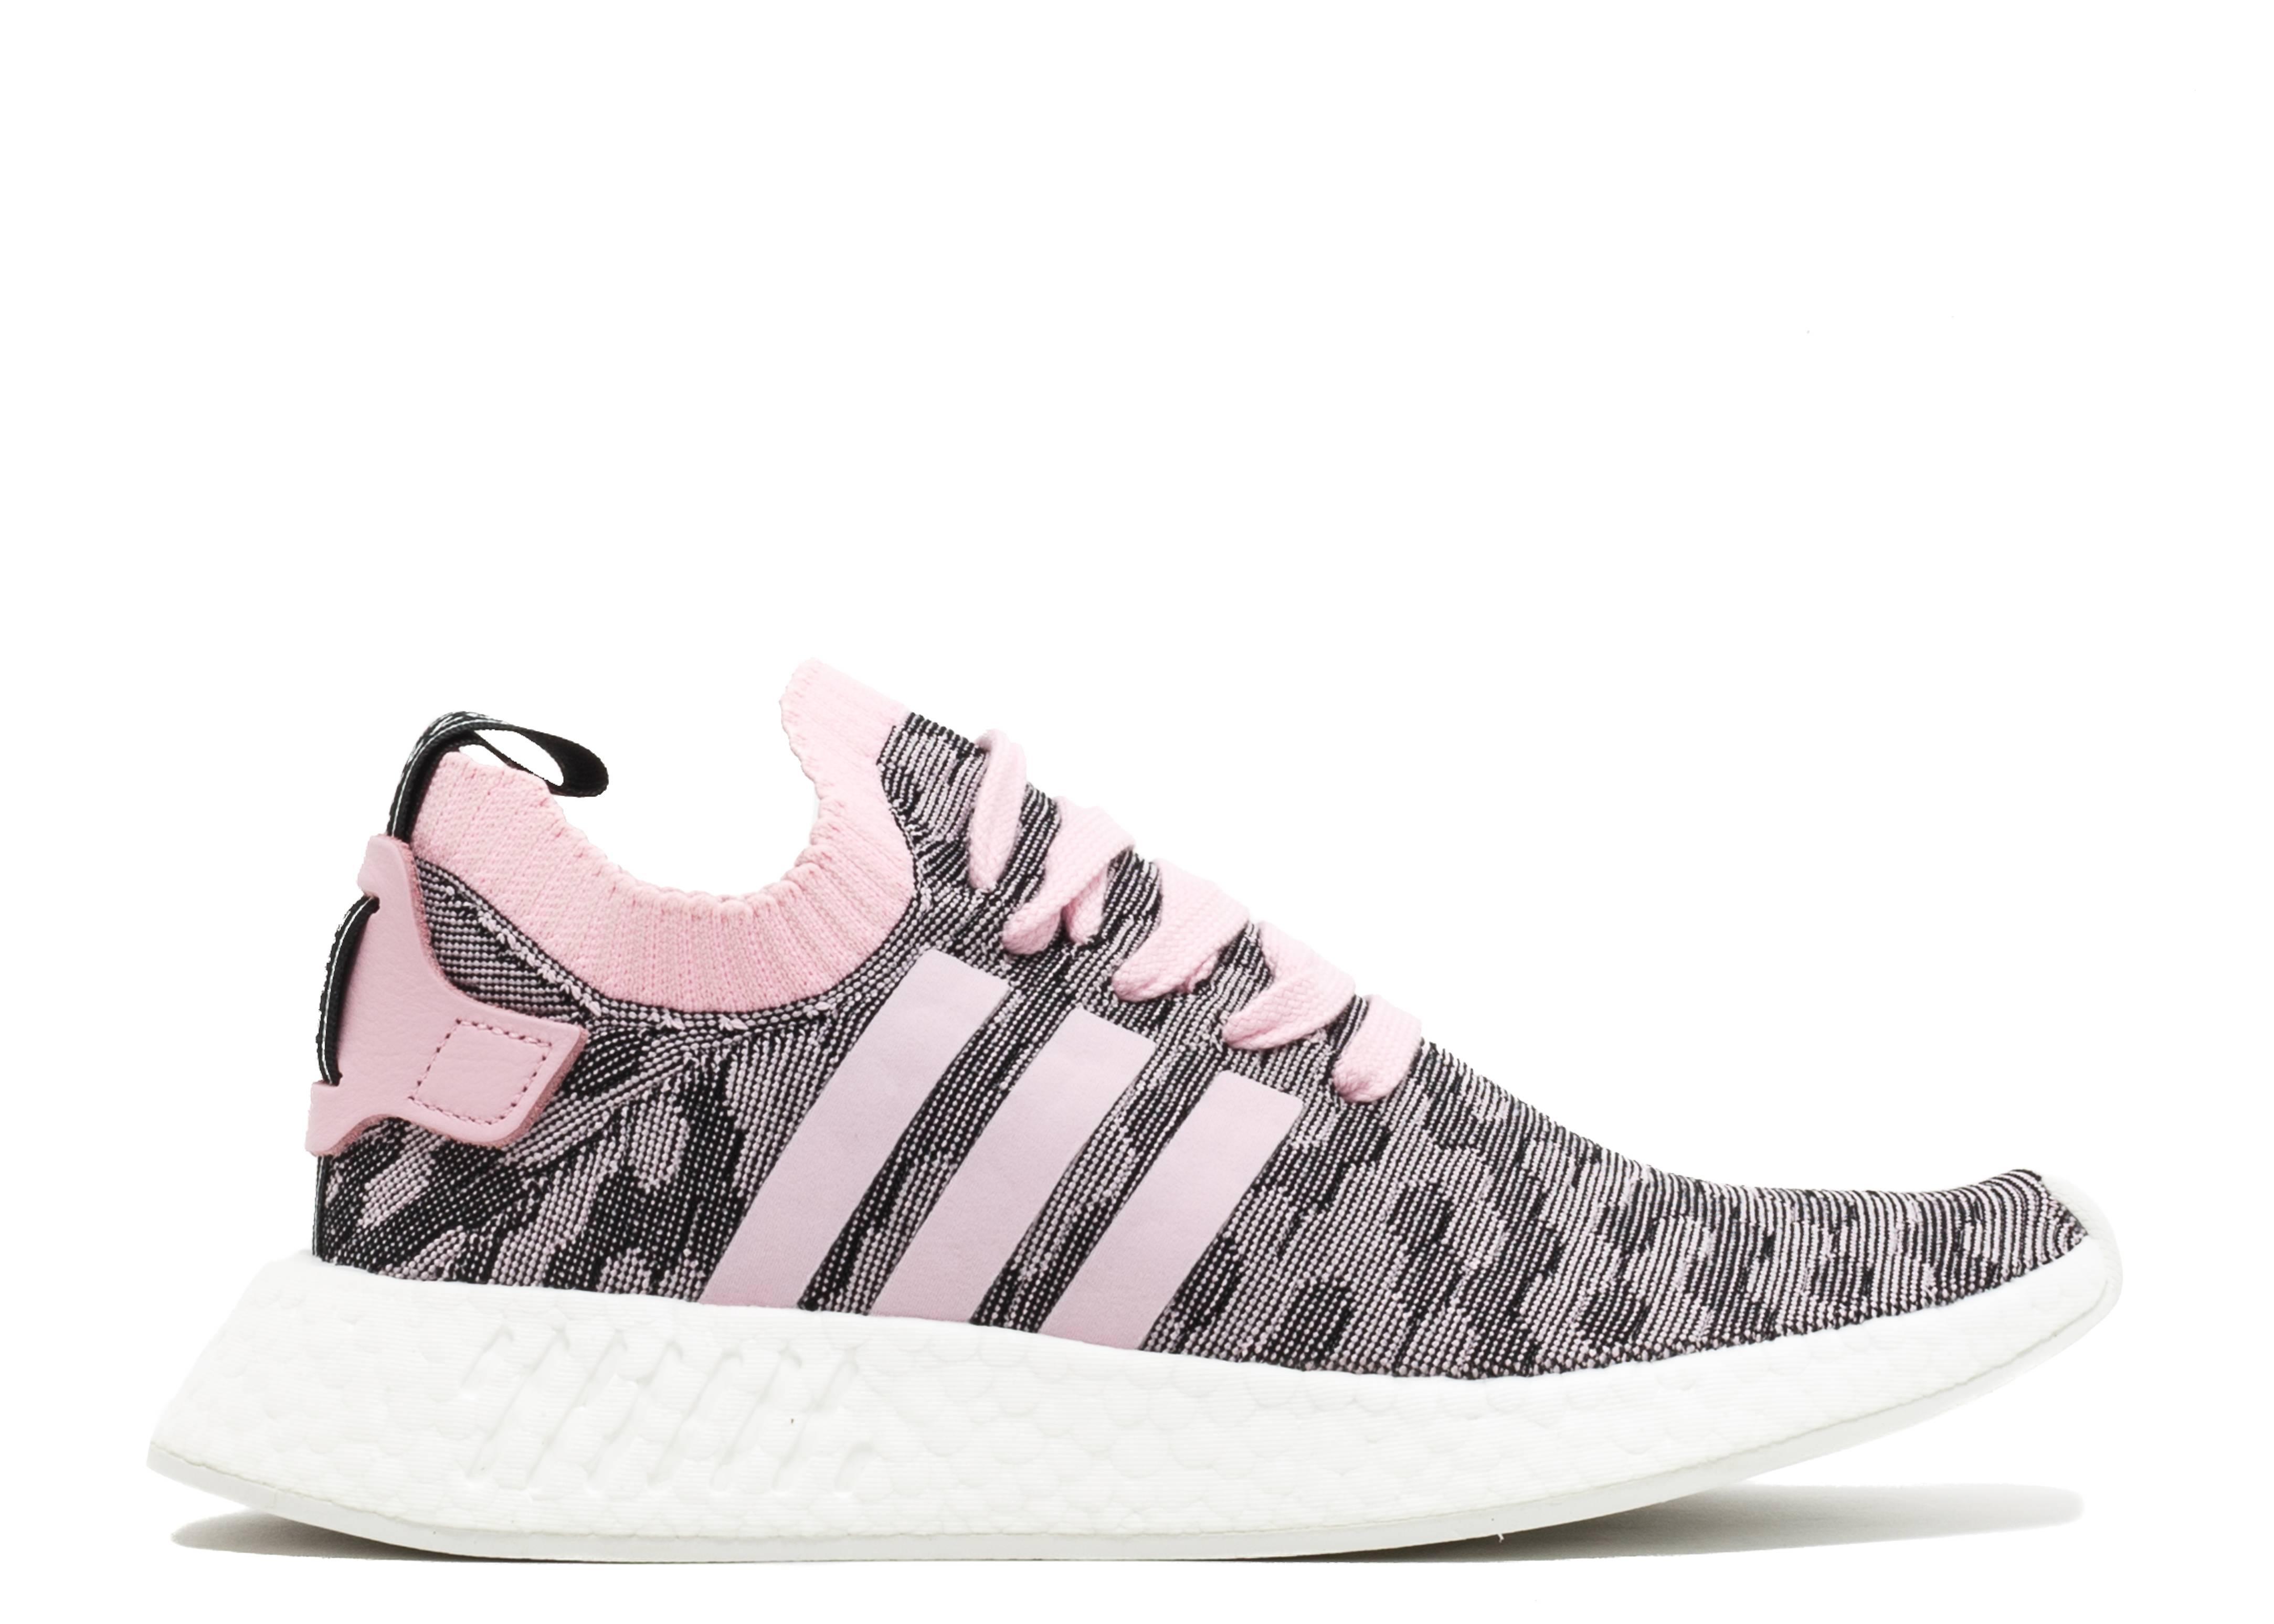 4d51c689251cbe Nmd R2 Pk W - Adidas - by9521 - wonder pink  wonder pink  core black ...